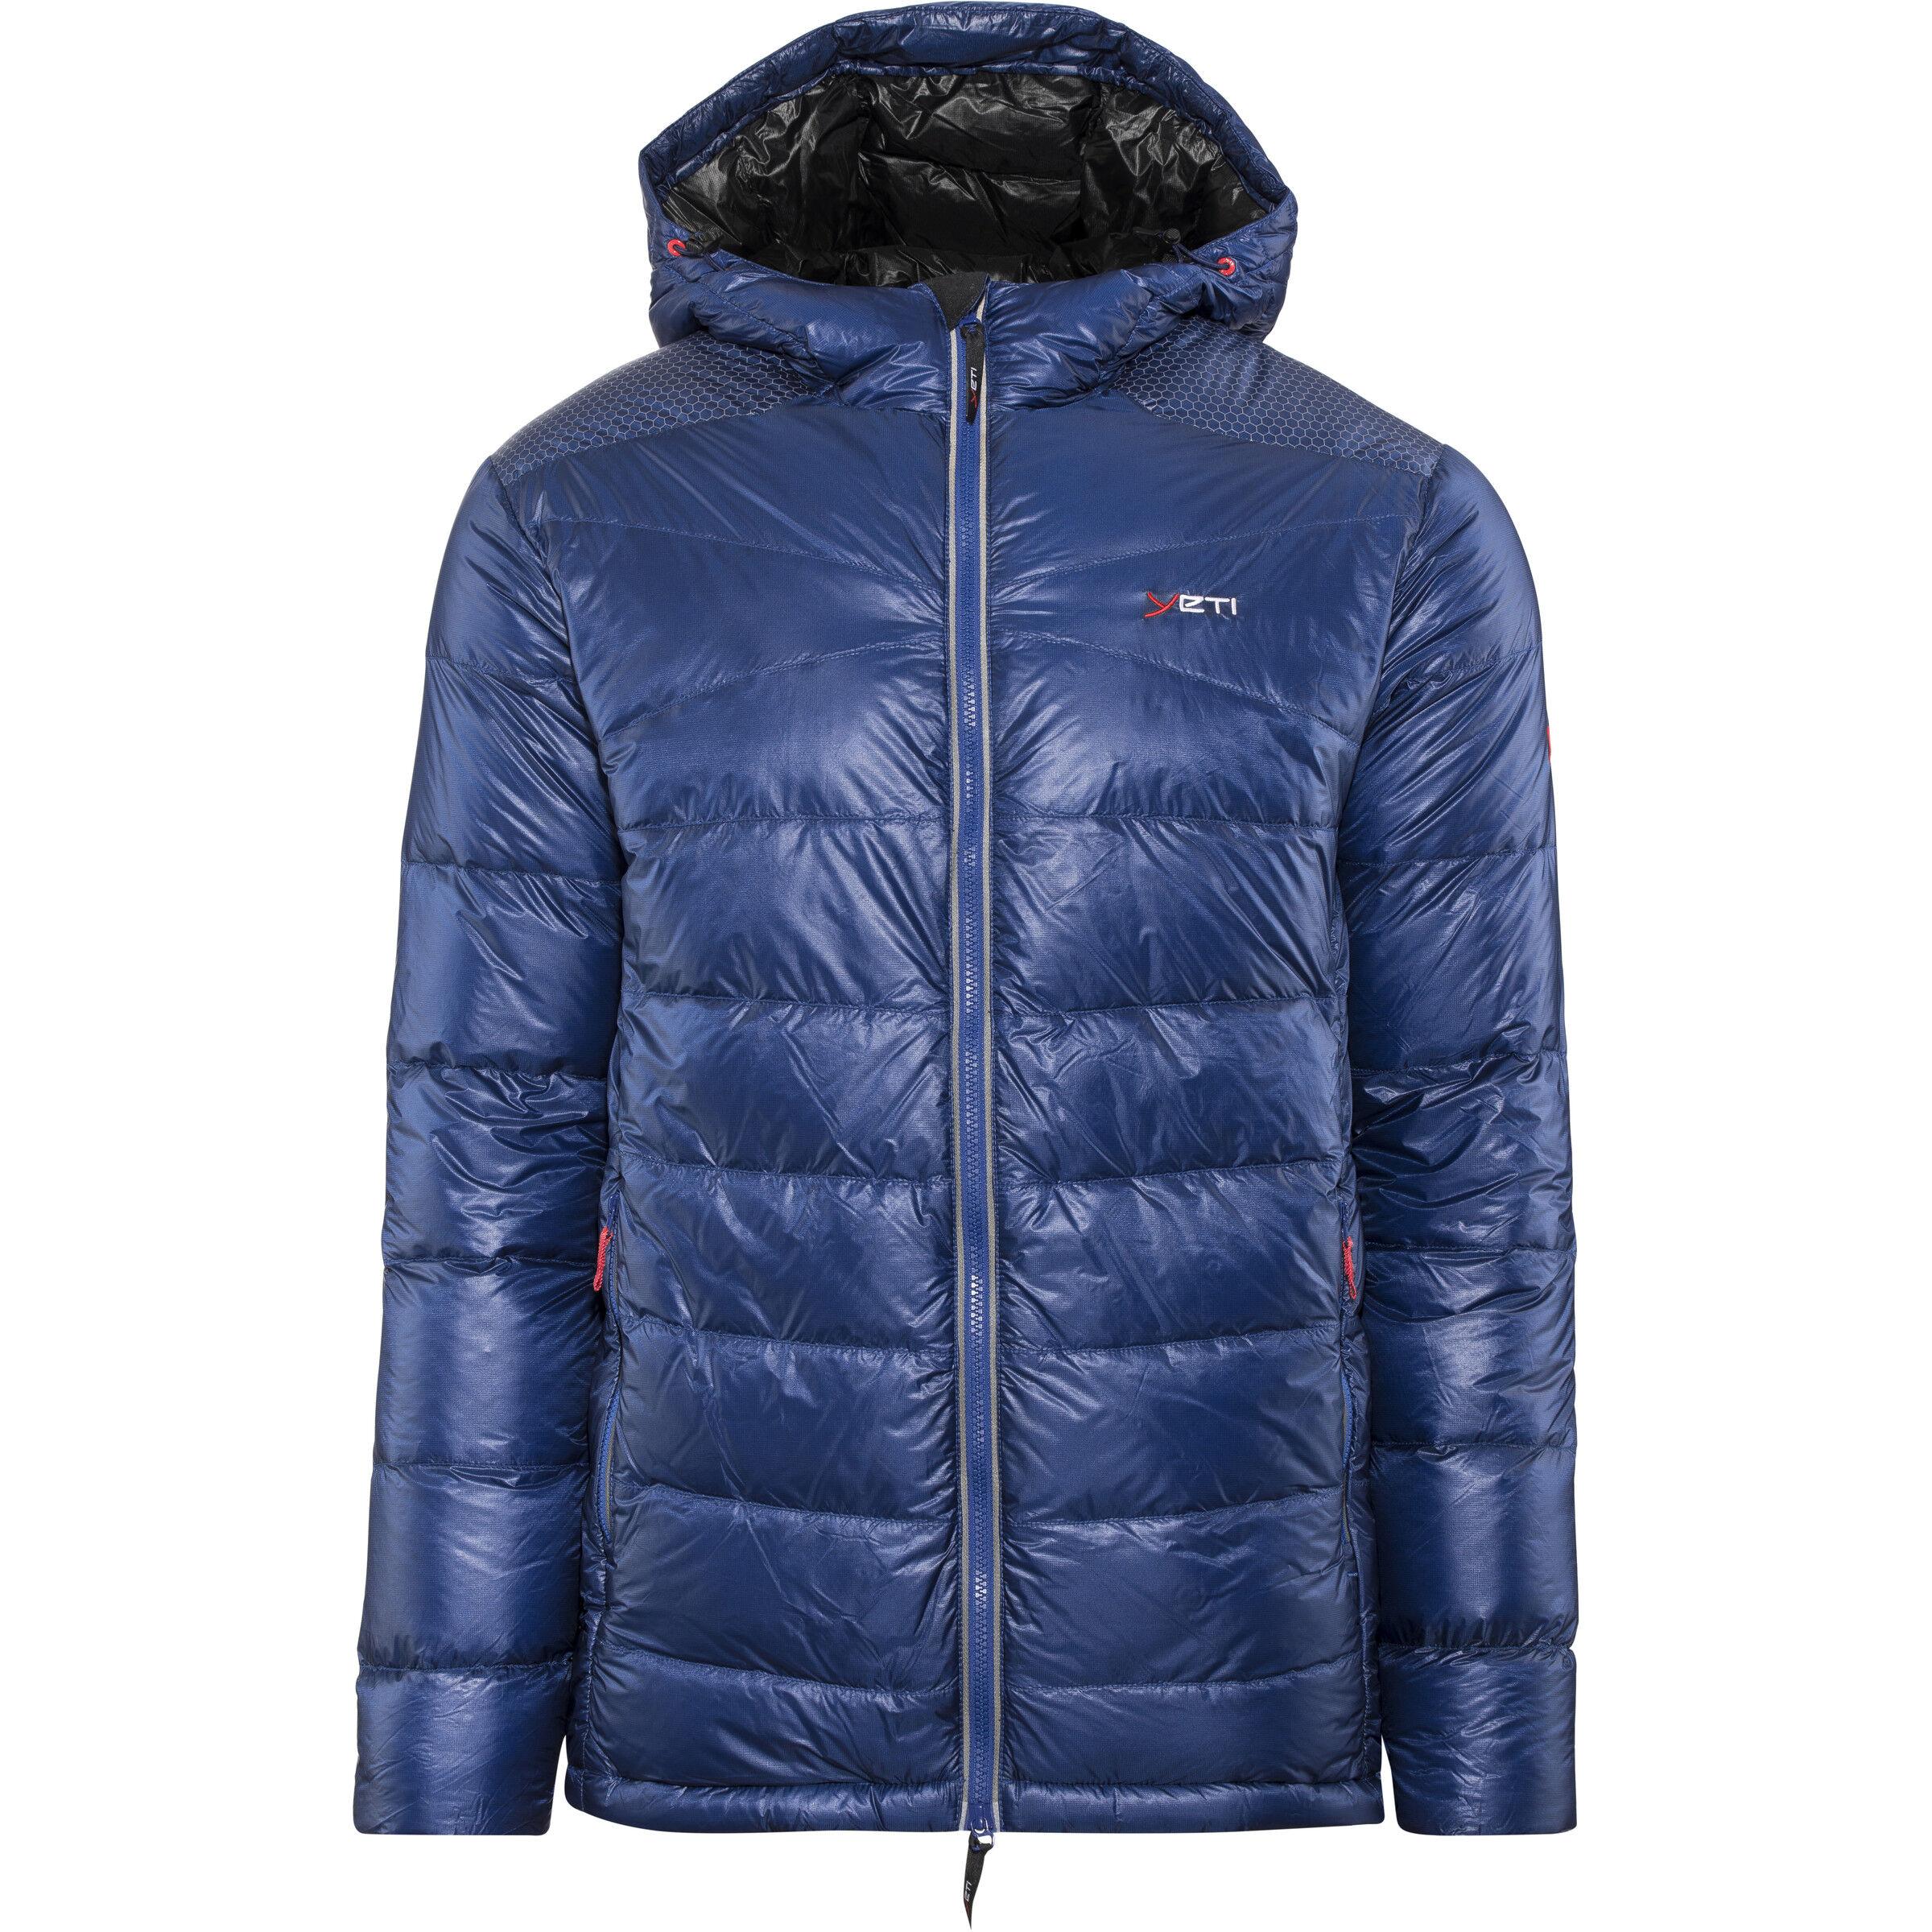 Yeti Daunenjacke & Winterjacke günstig online kaufen |